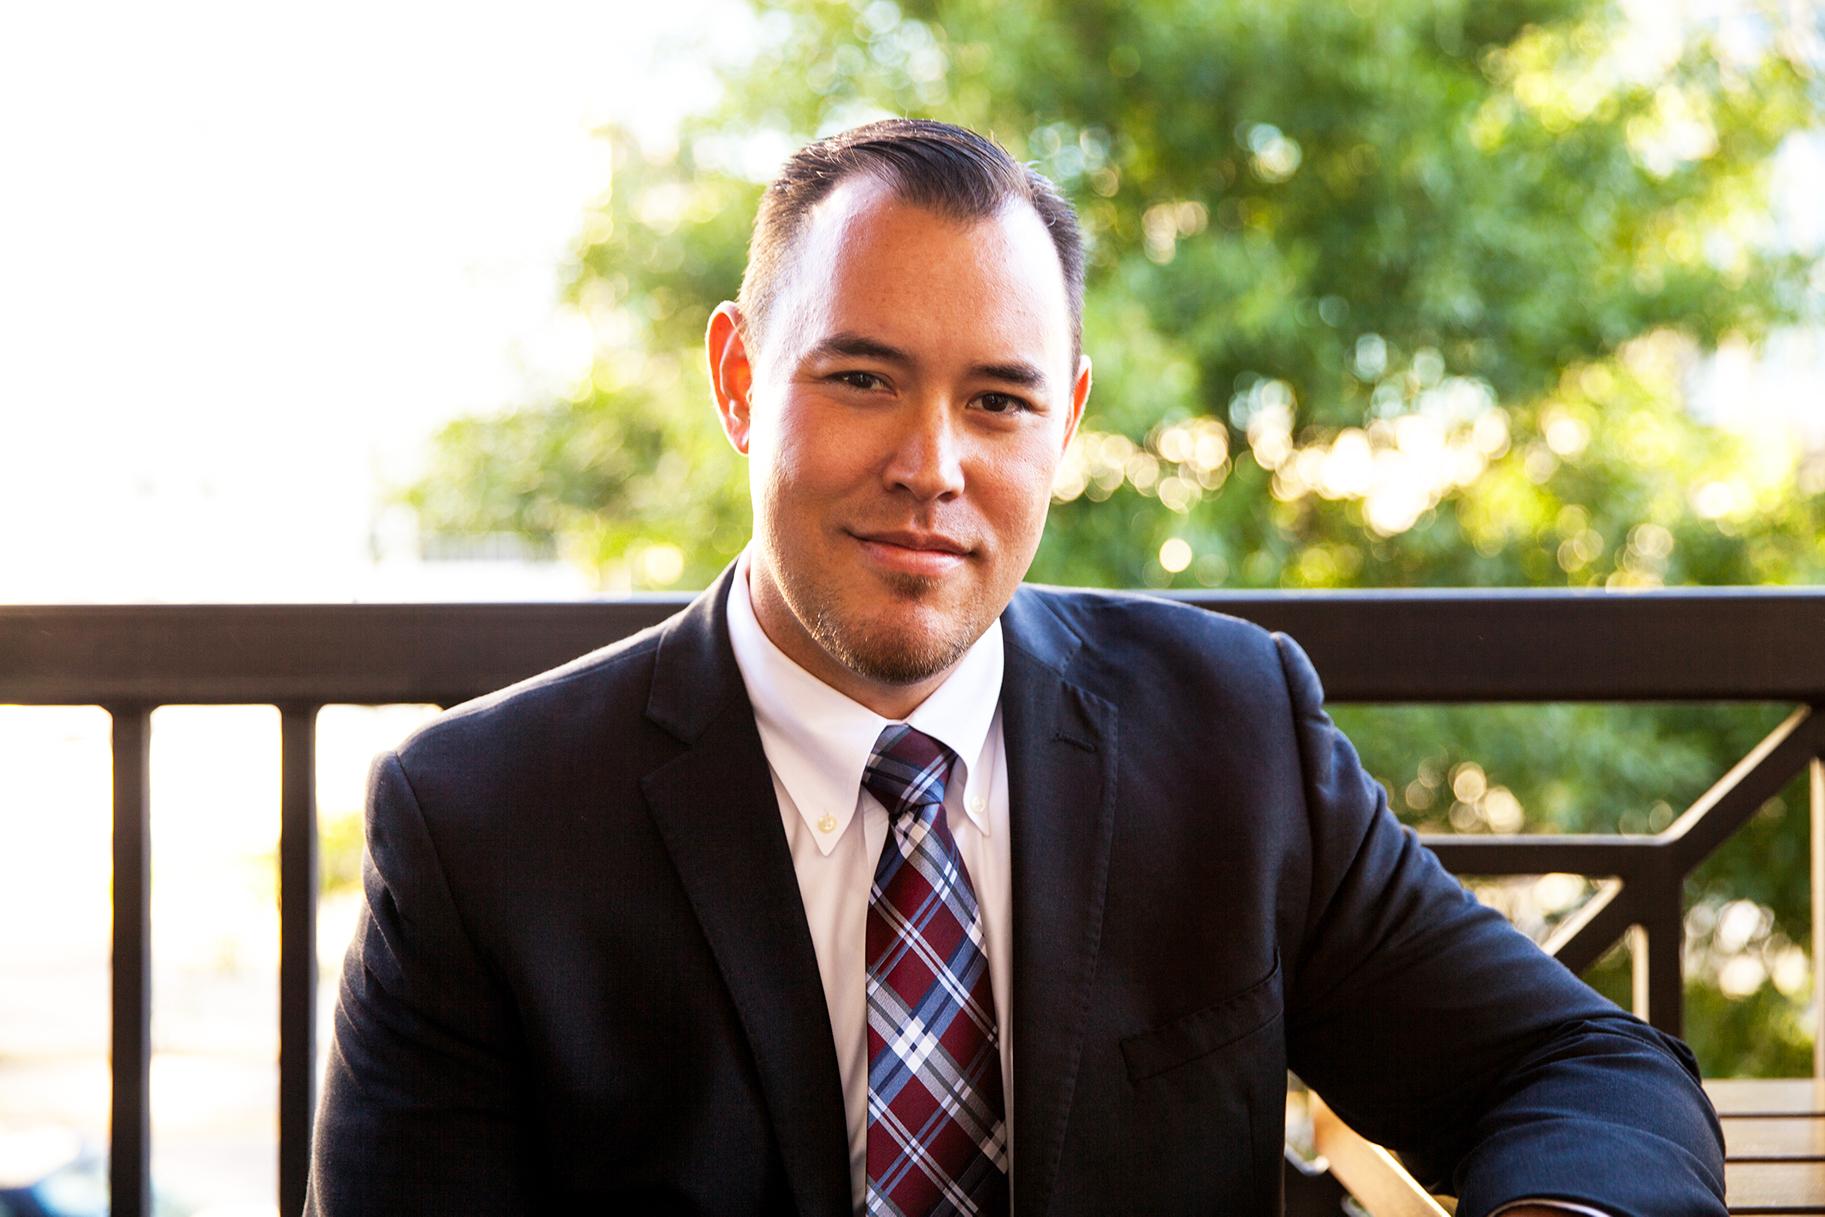 Jordan Kragten, Attorney at Law